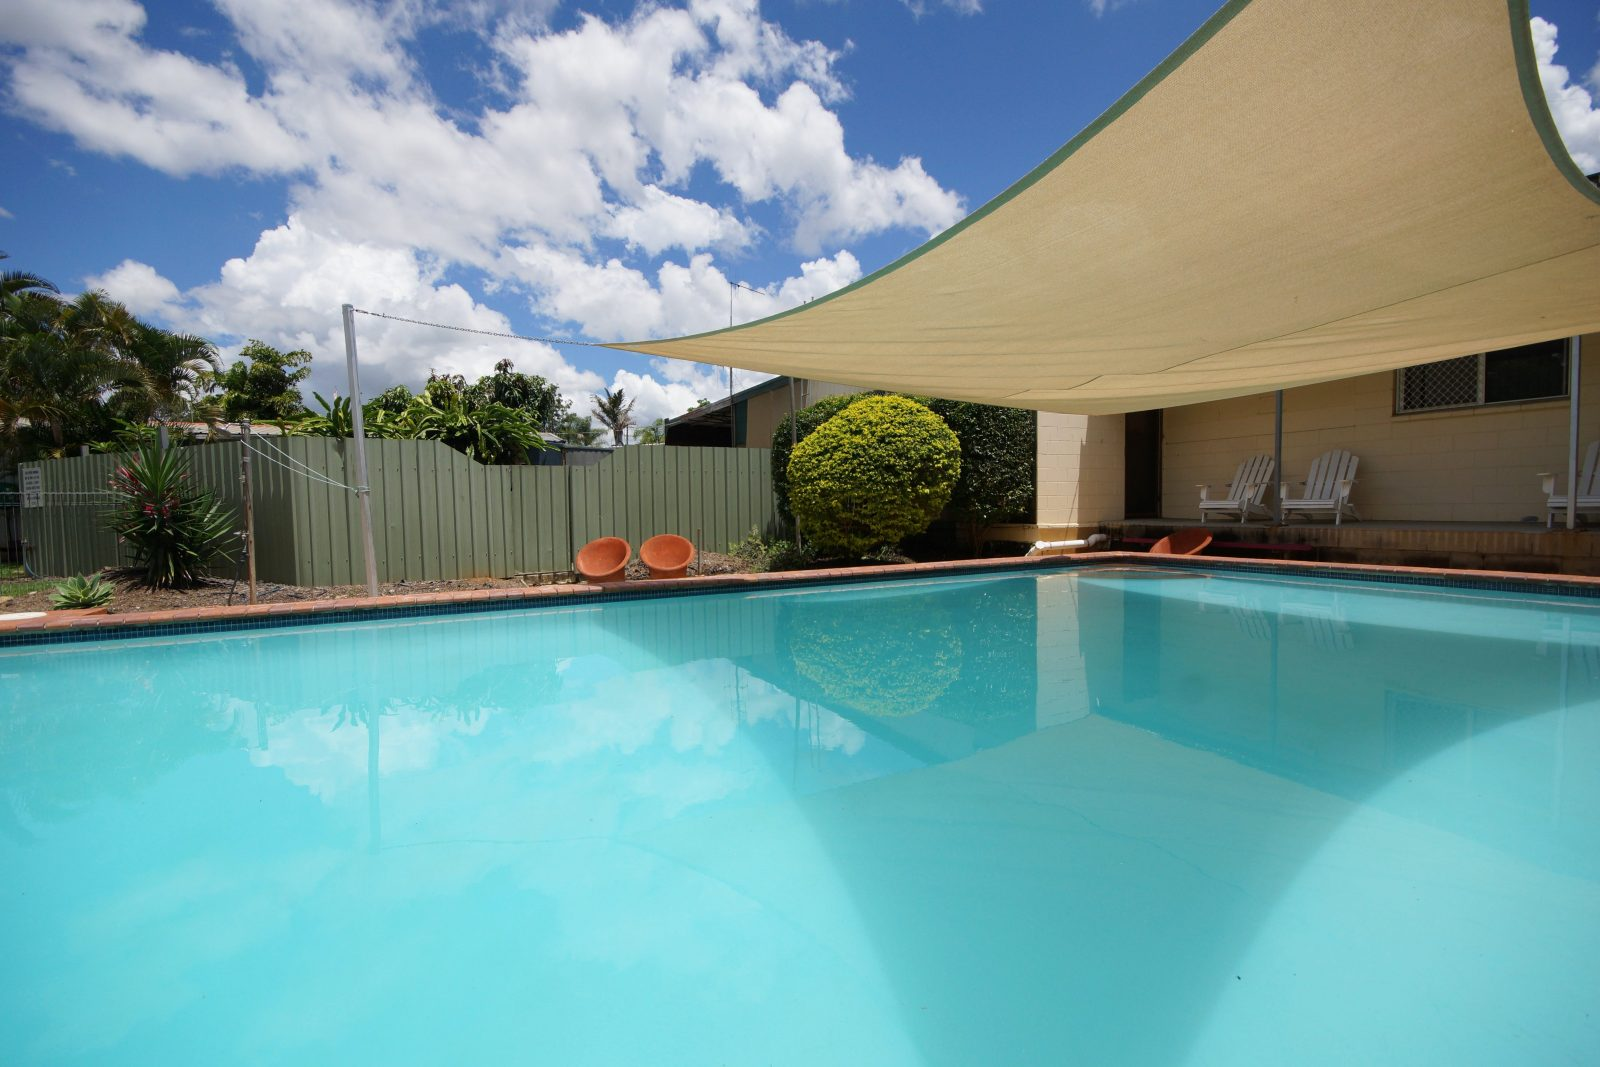 Bundaberg Pool